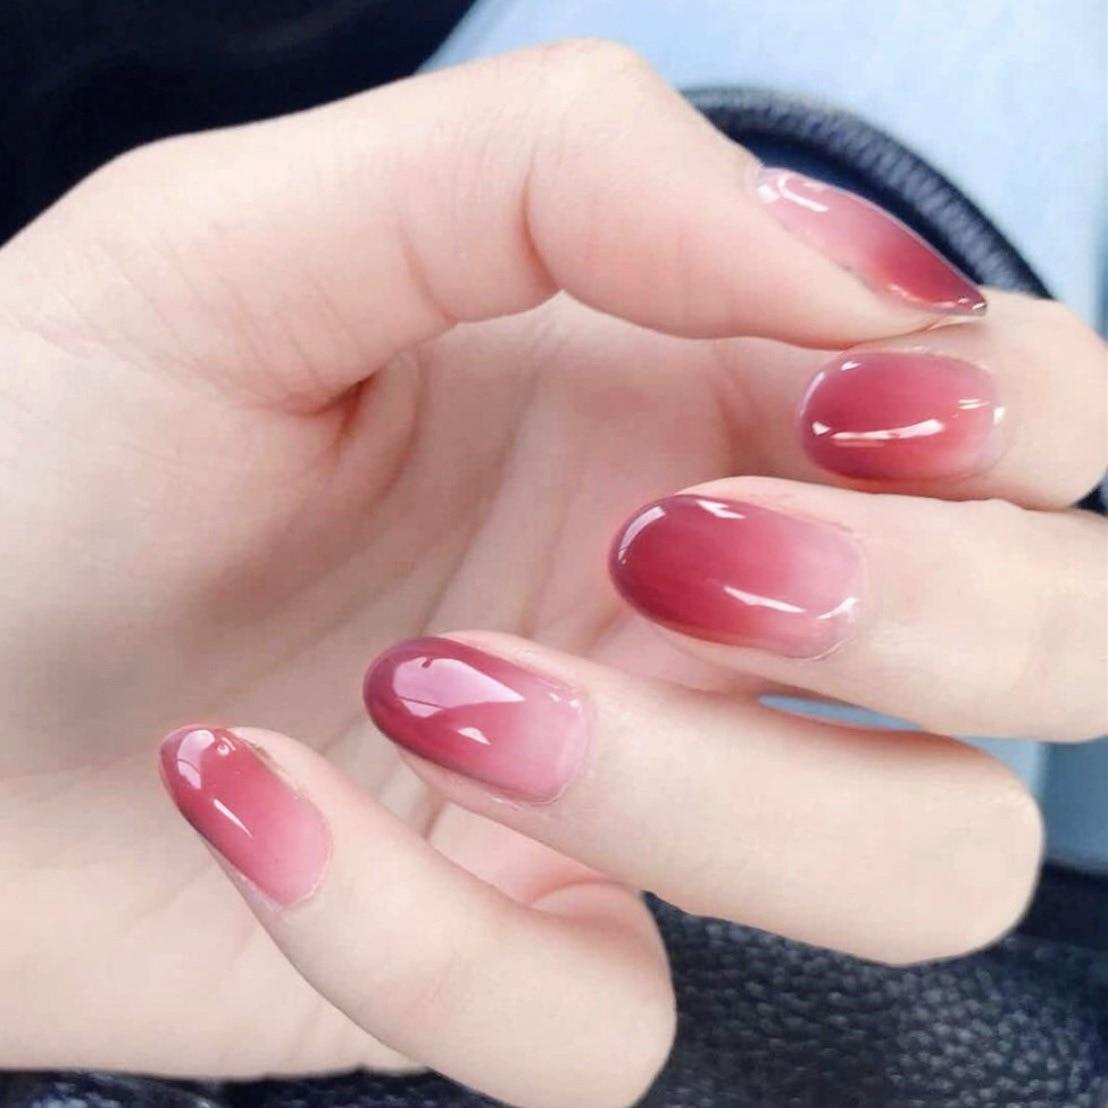 24 pçs oval tipsy gradiente cor-de-rosa unhas falsas com desenhos dicas de unhas capa completa falso arte do prego falso ongles unhas presente